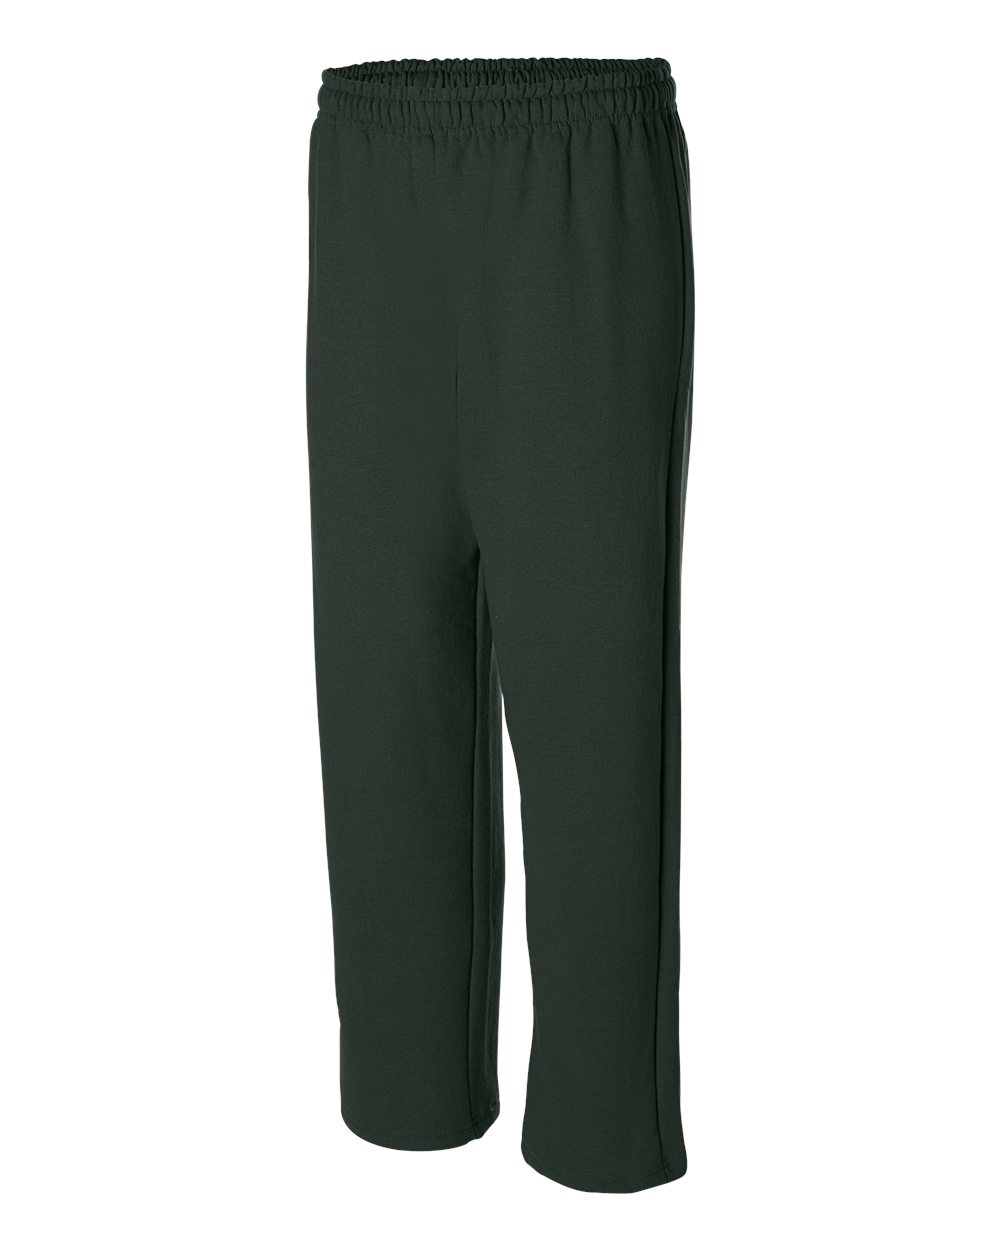 Picture of Gildan No Pocket/Open Bottom Pants